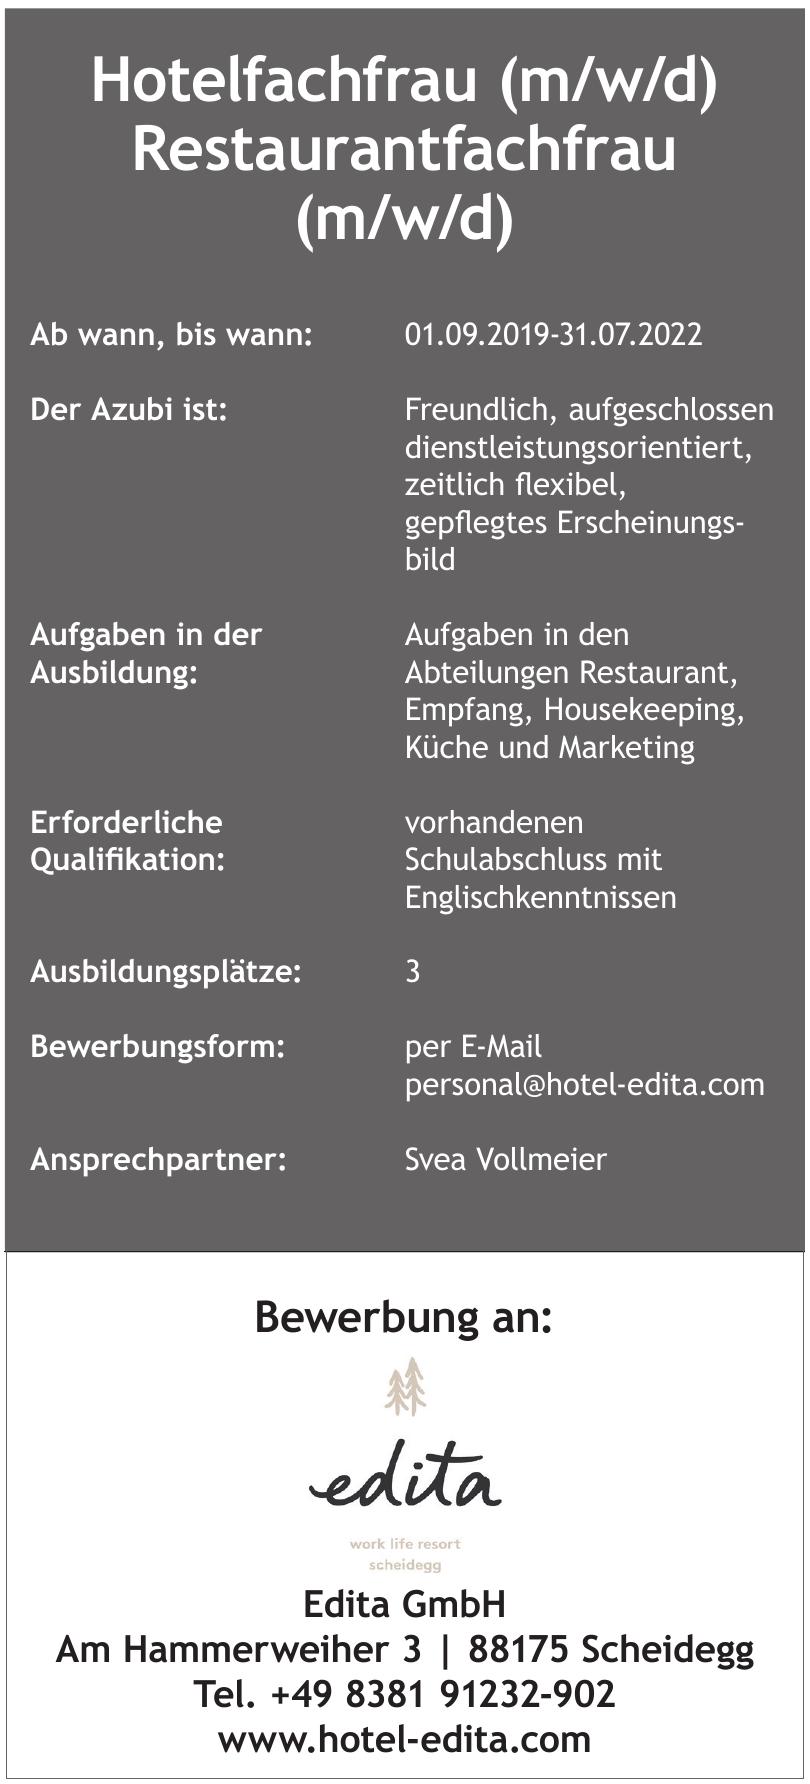 Edita GmbH